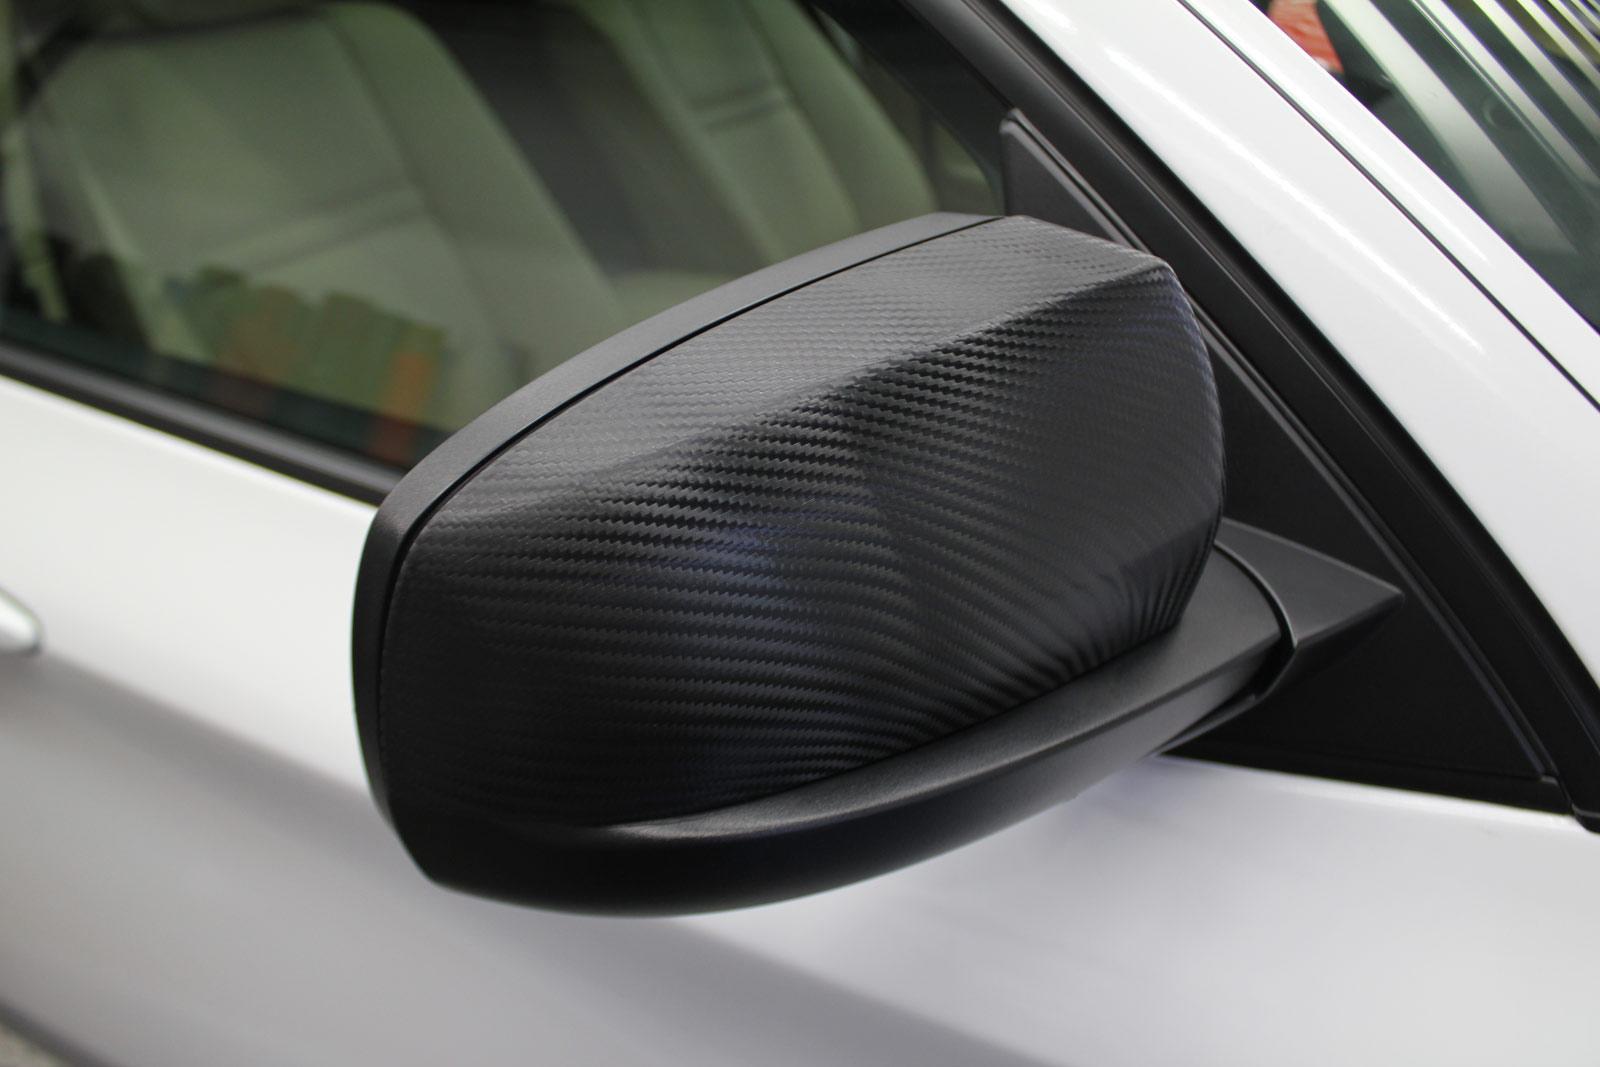 BMW_X6_FOLIERUNG_WEISS_GLANZ_PLUS_CARBON_02